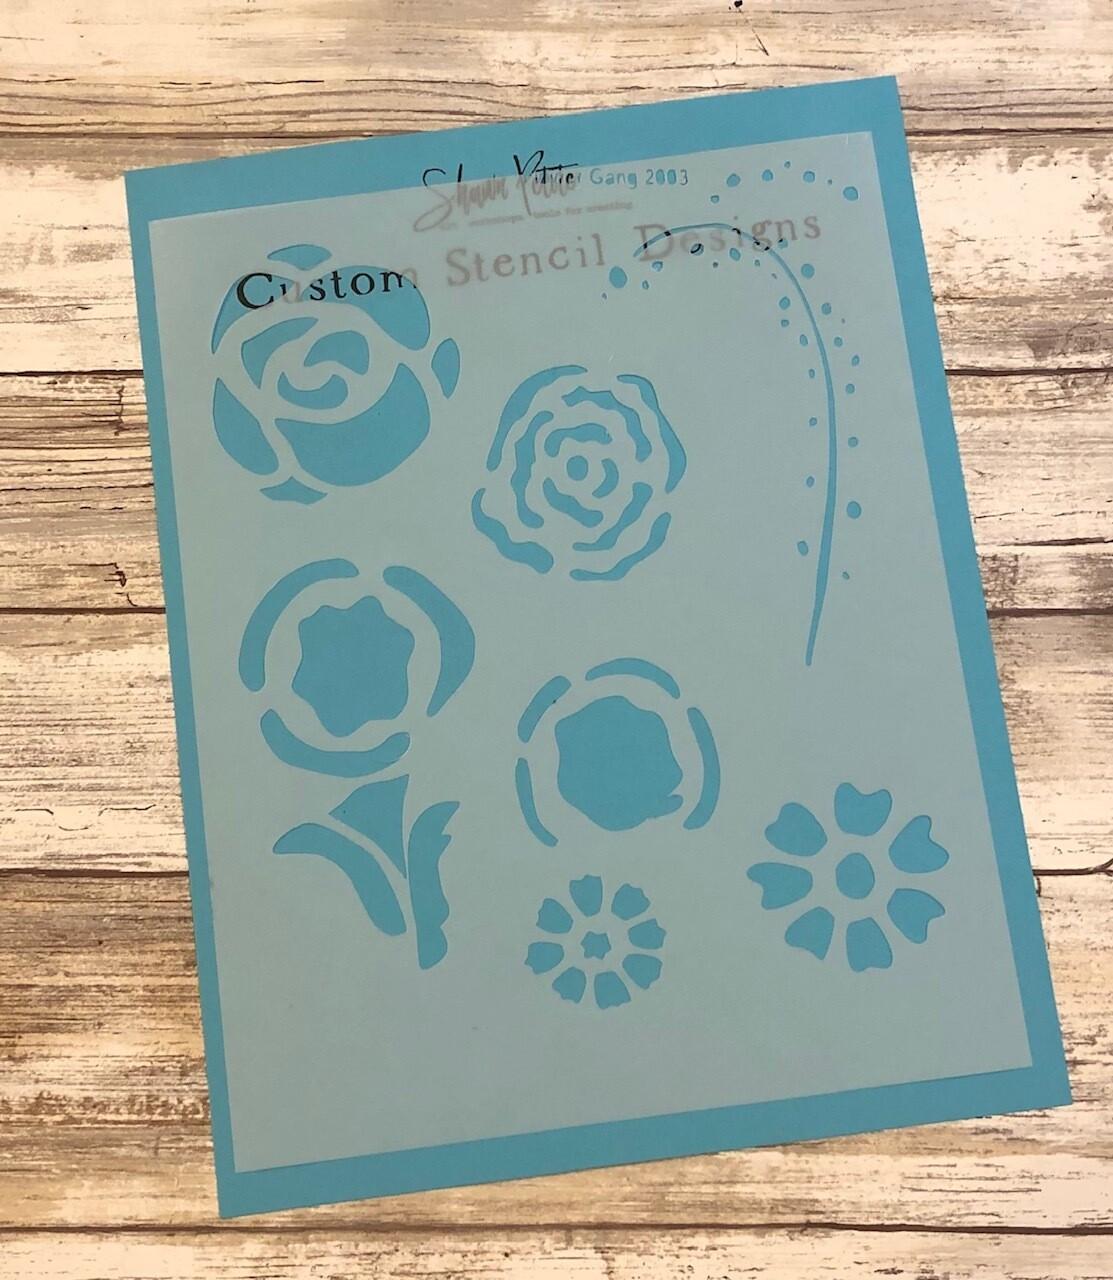 """Flower Gang 2003"" clearance stencils"